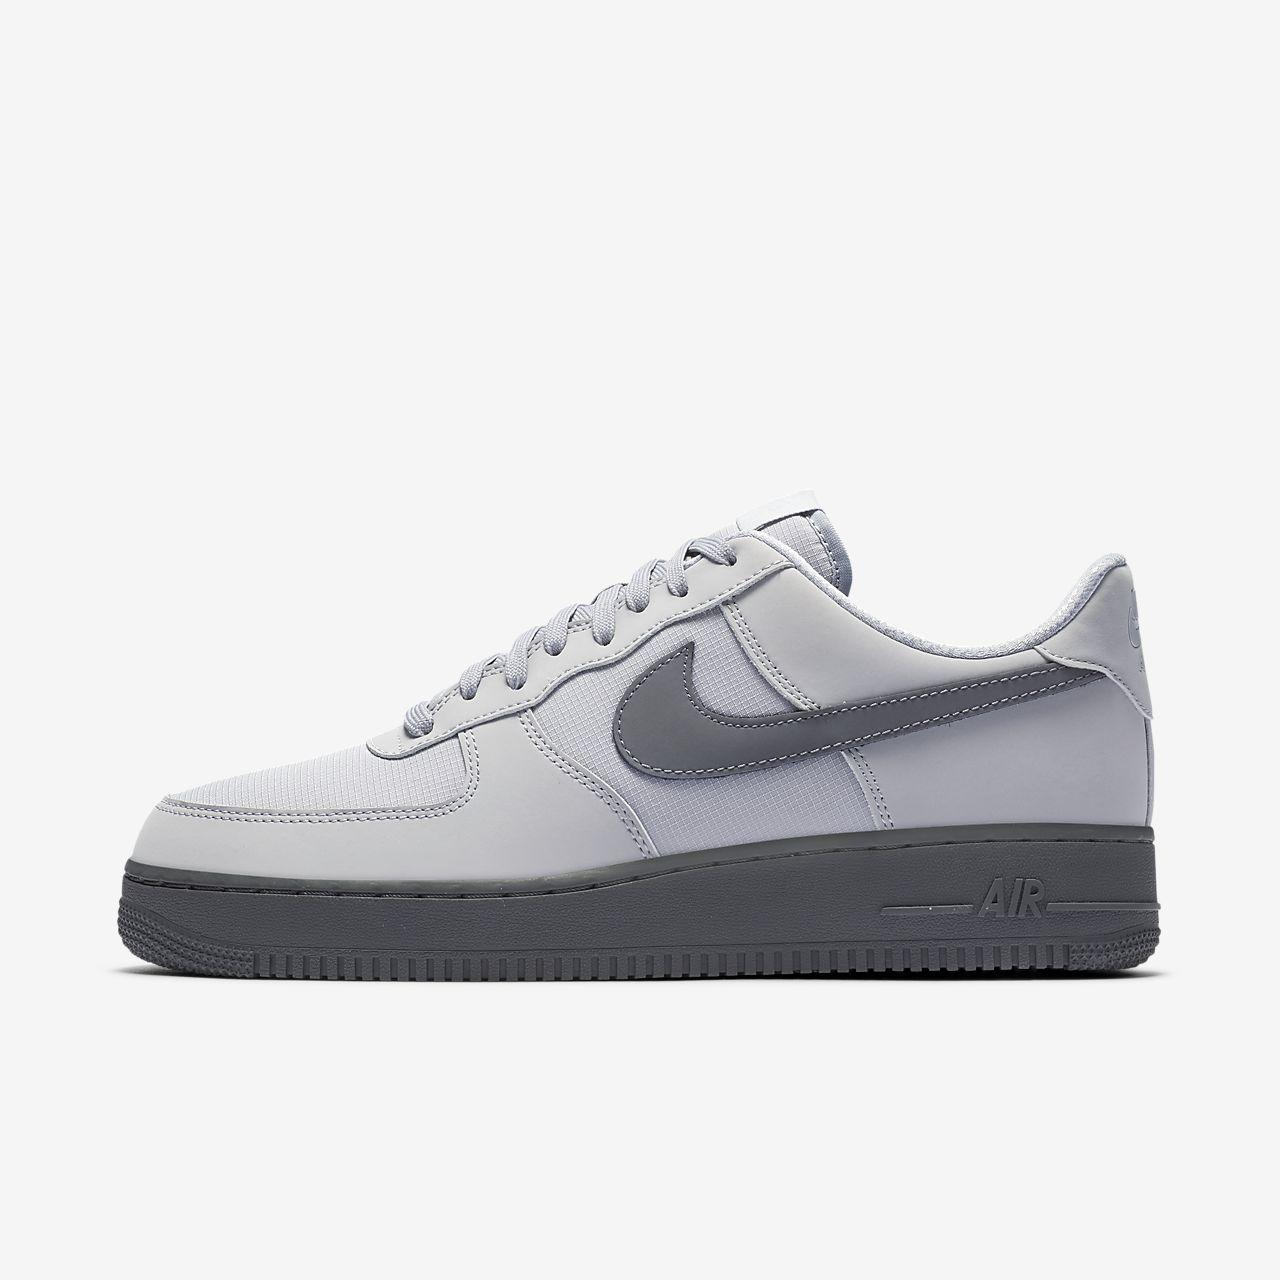 quality design 69e90 18d9b ... Chaussure Nike Air Force 1  07 pour Homme